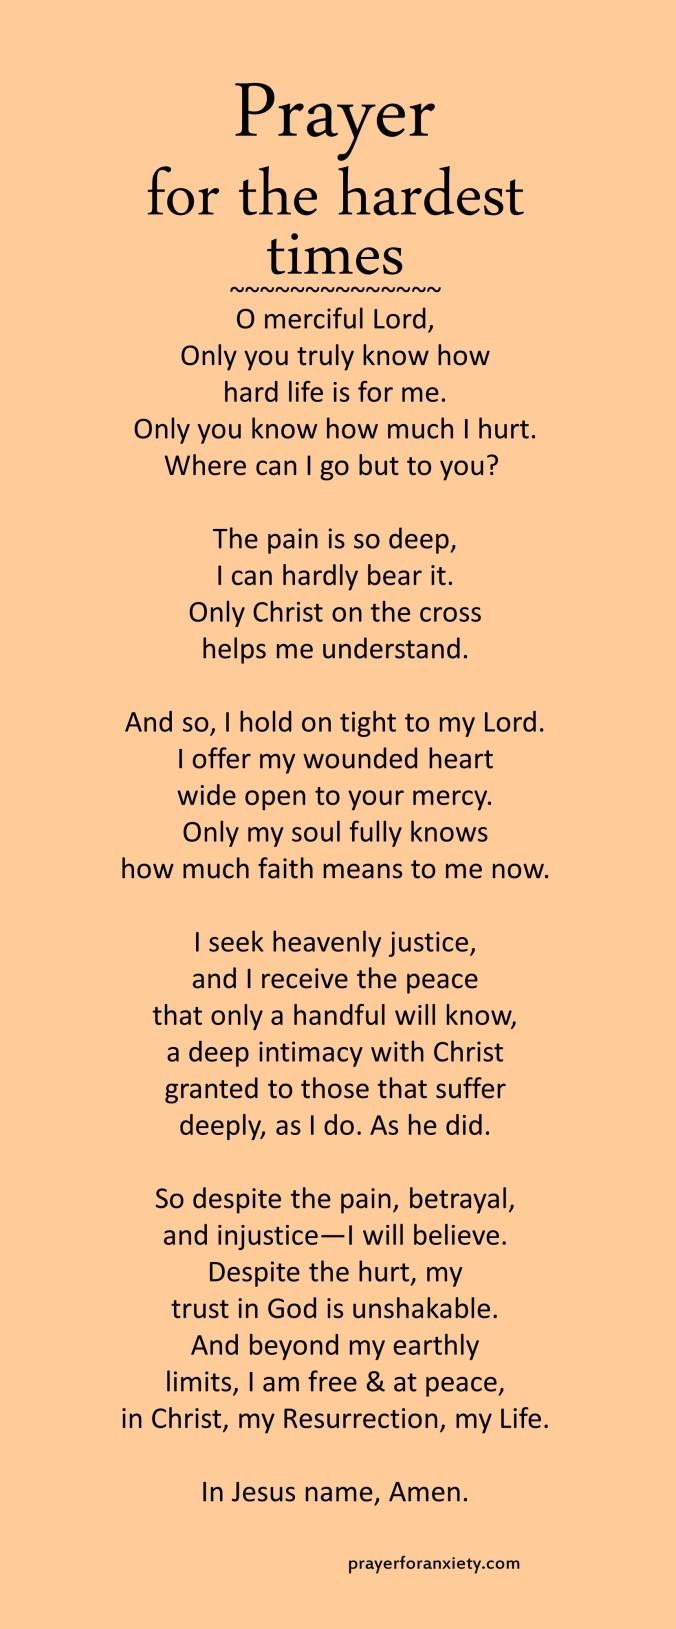 Prayer for the hardest times